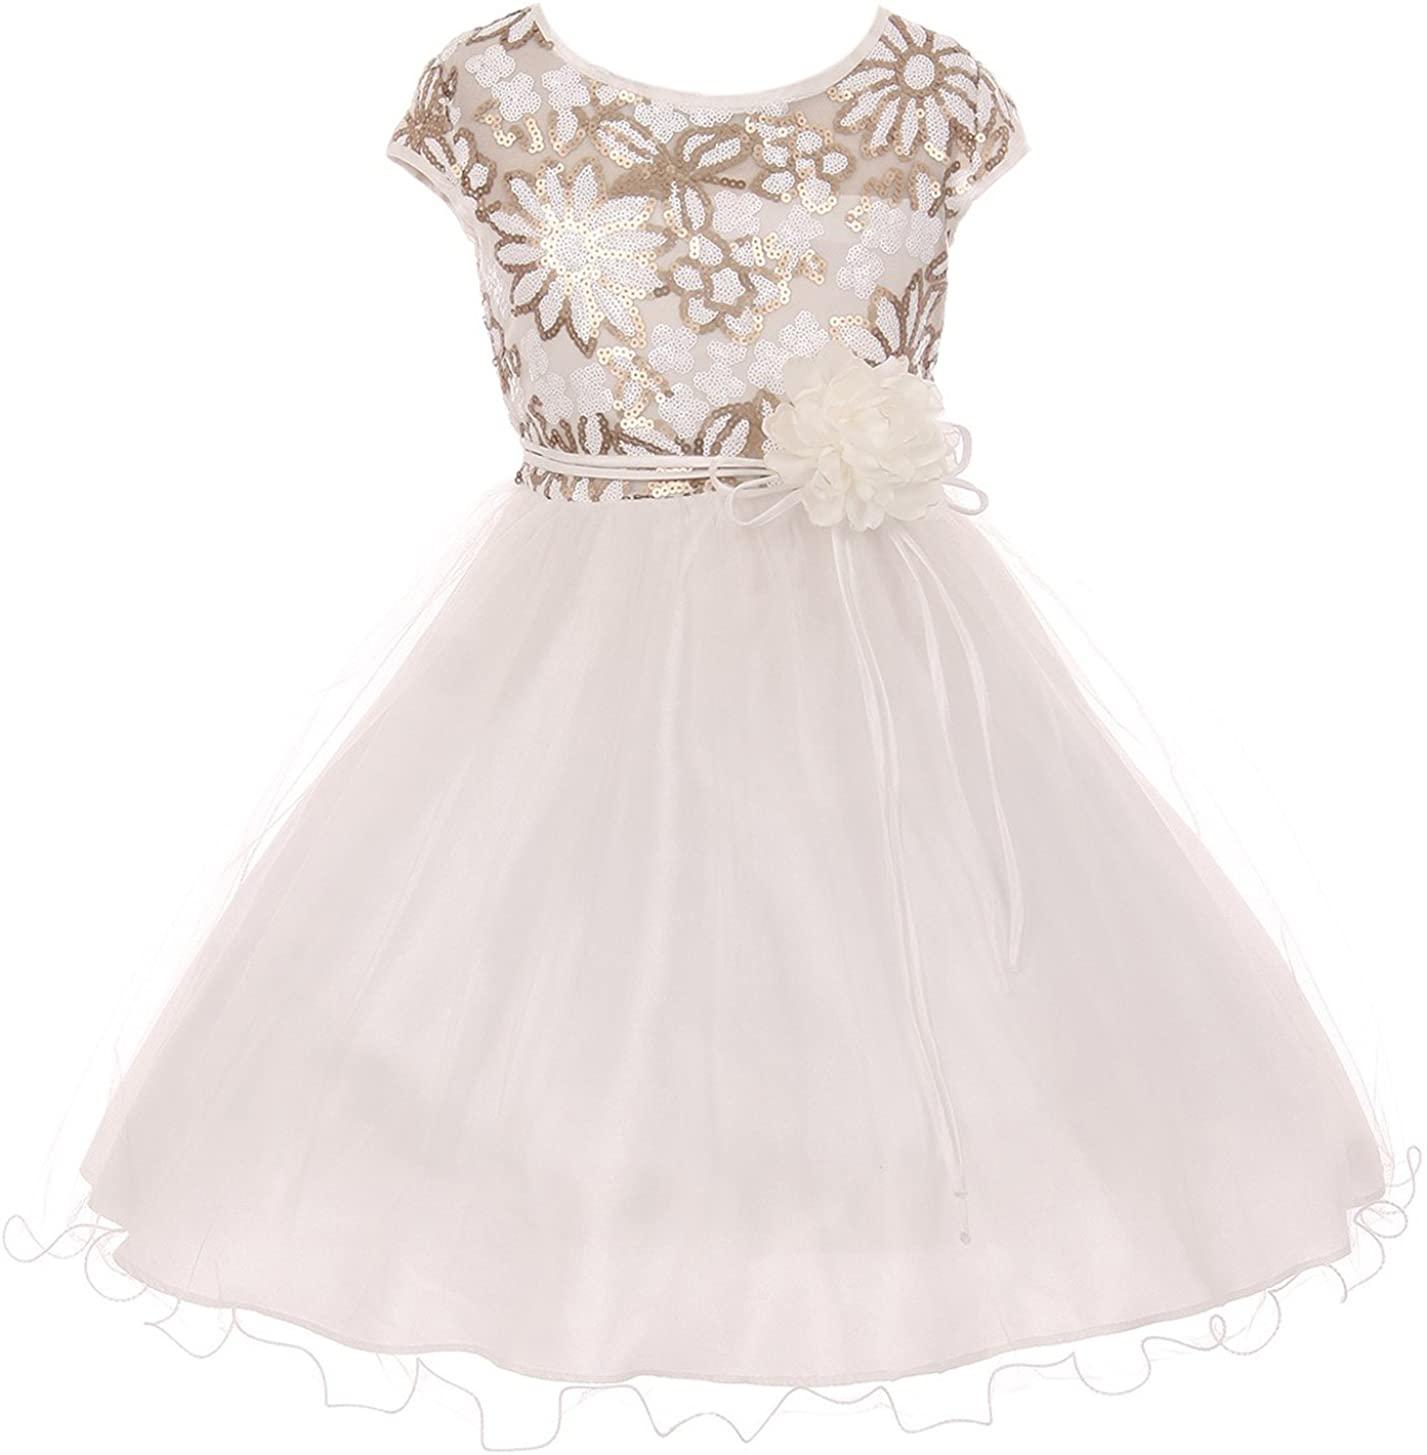 BluNight Elegant Cap Sleeve Sequin Pageant Easter Wedding Flower Girl Dress 4-14